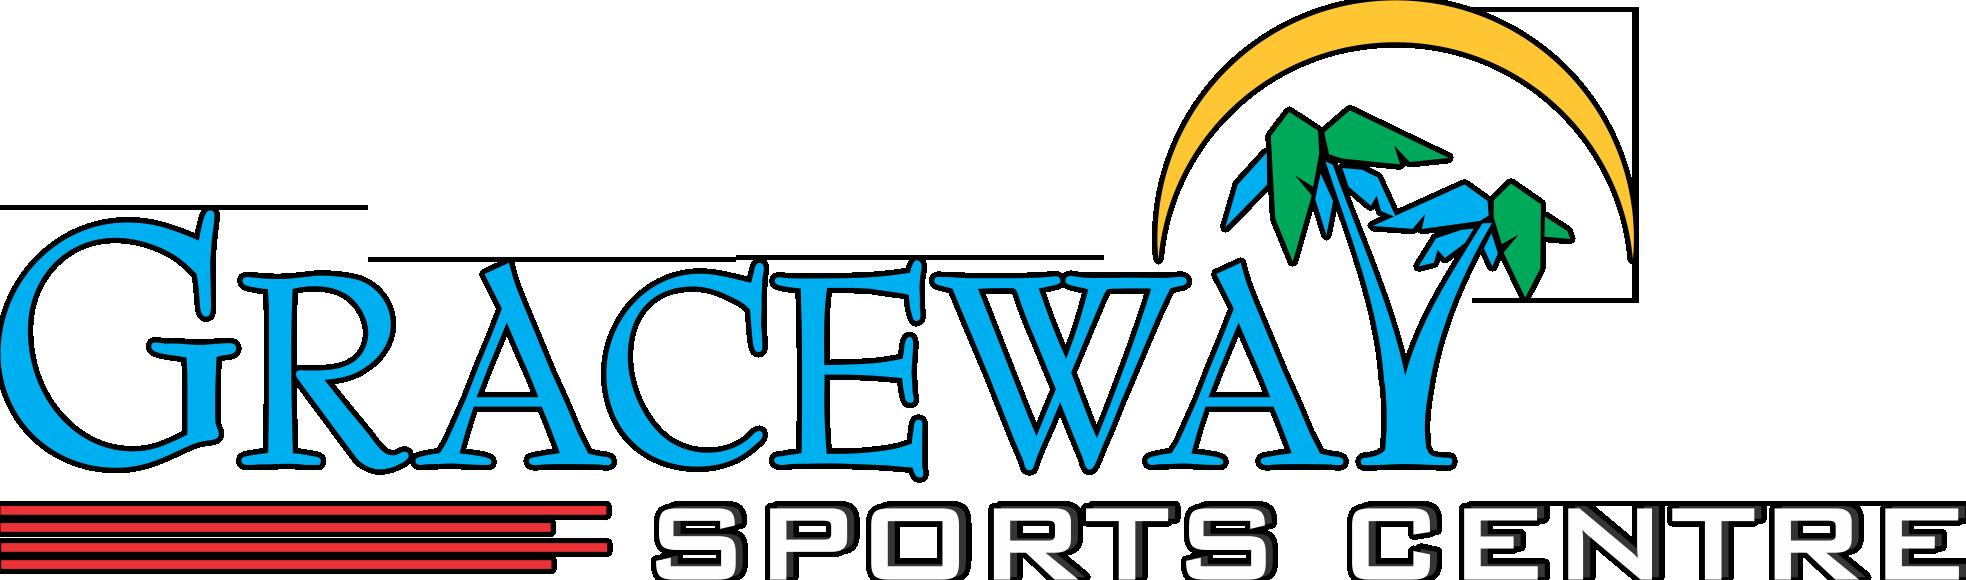 Graceway Sports Center.png